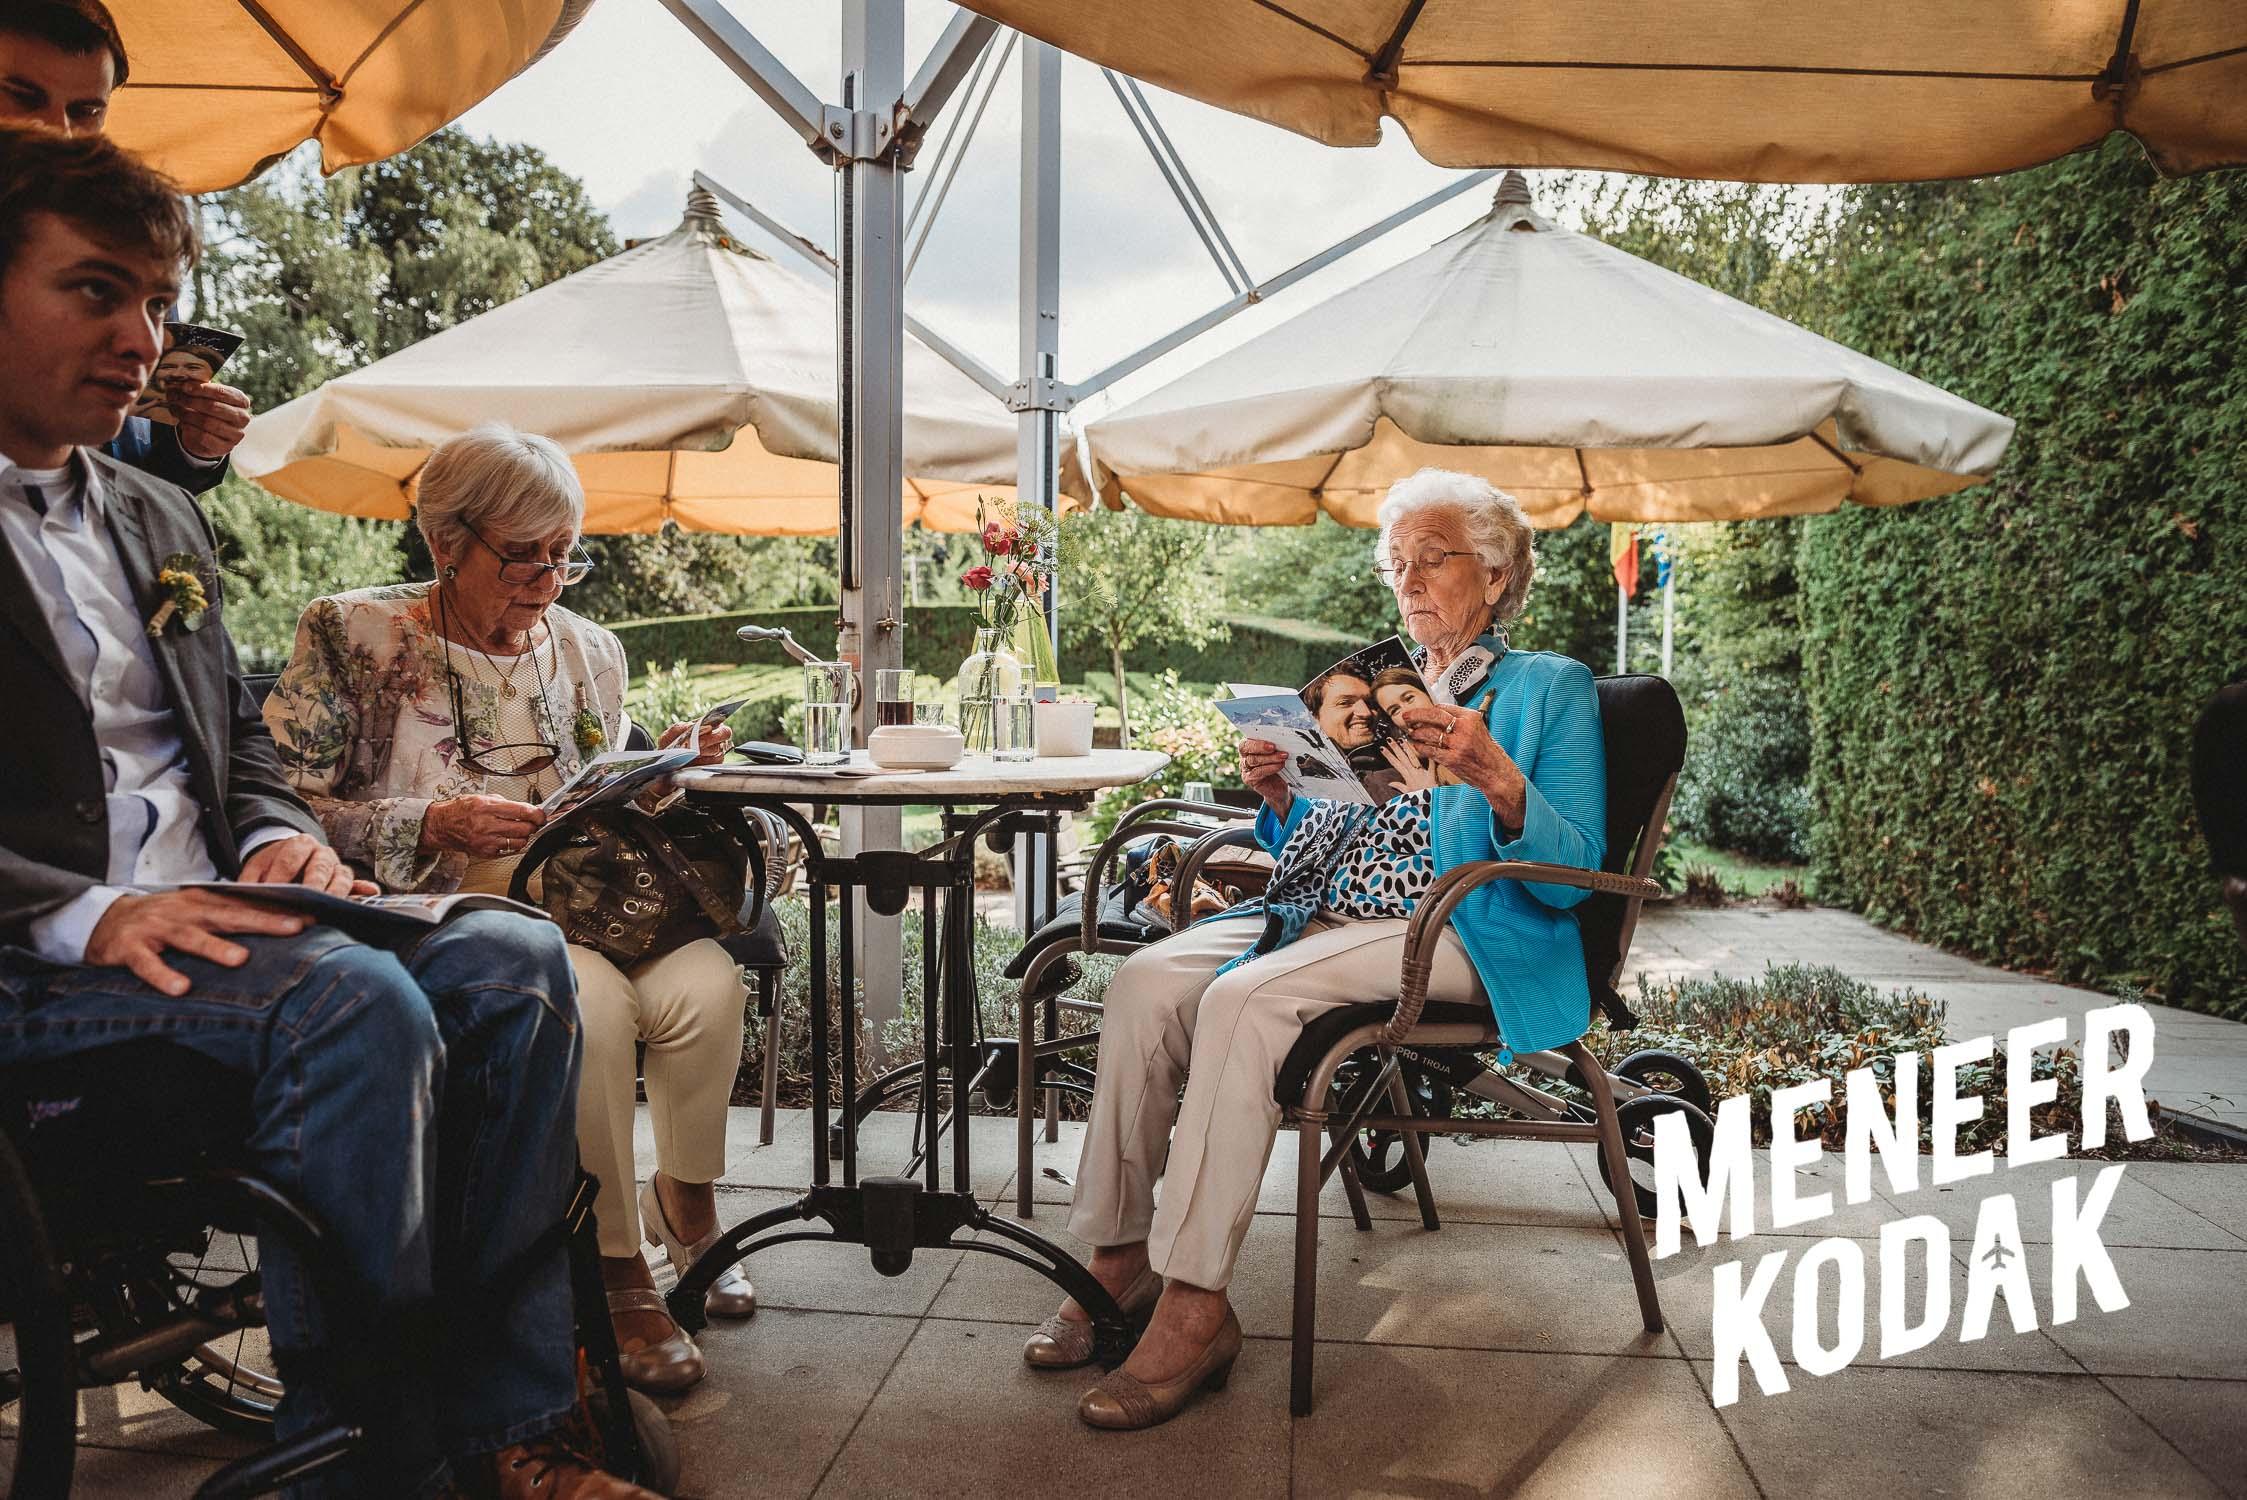 Meneer Kodak - Trouwreportage - Breda - E&M-126.jpg